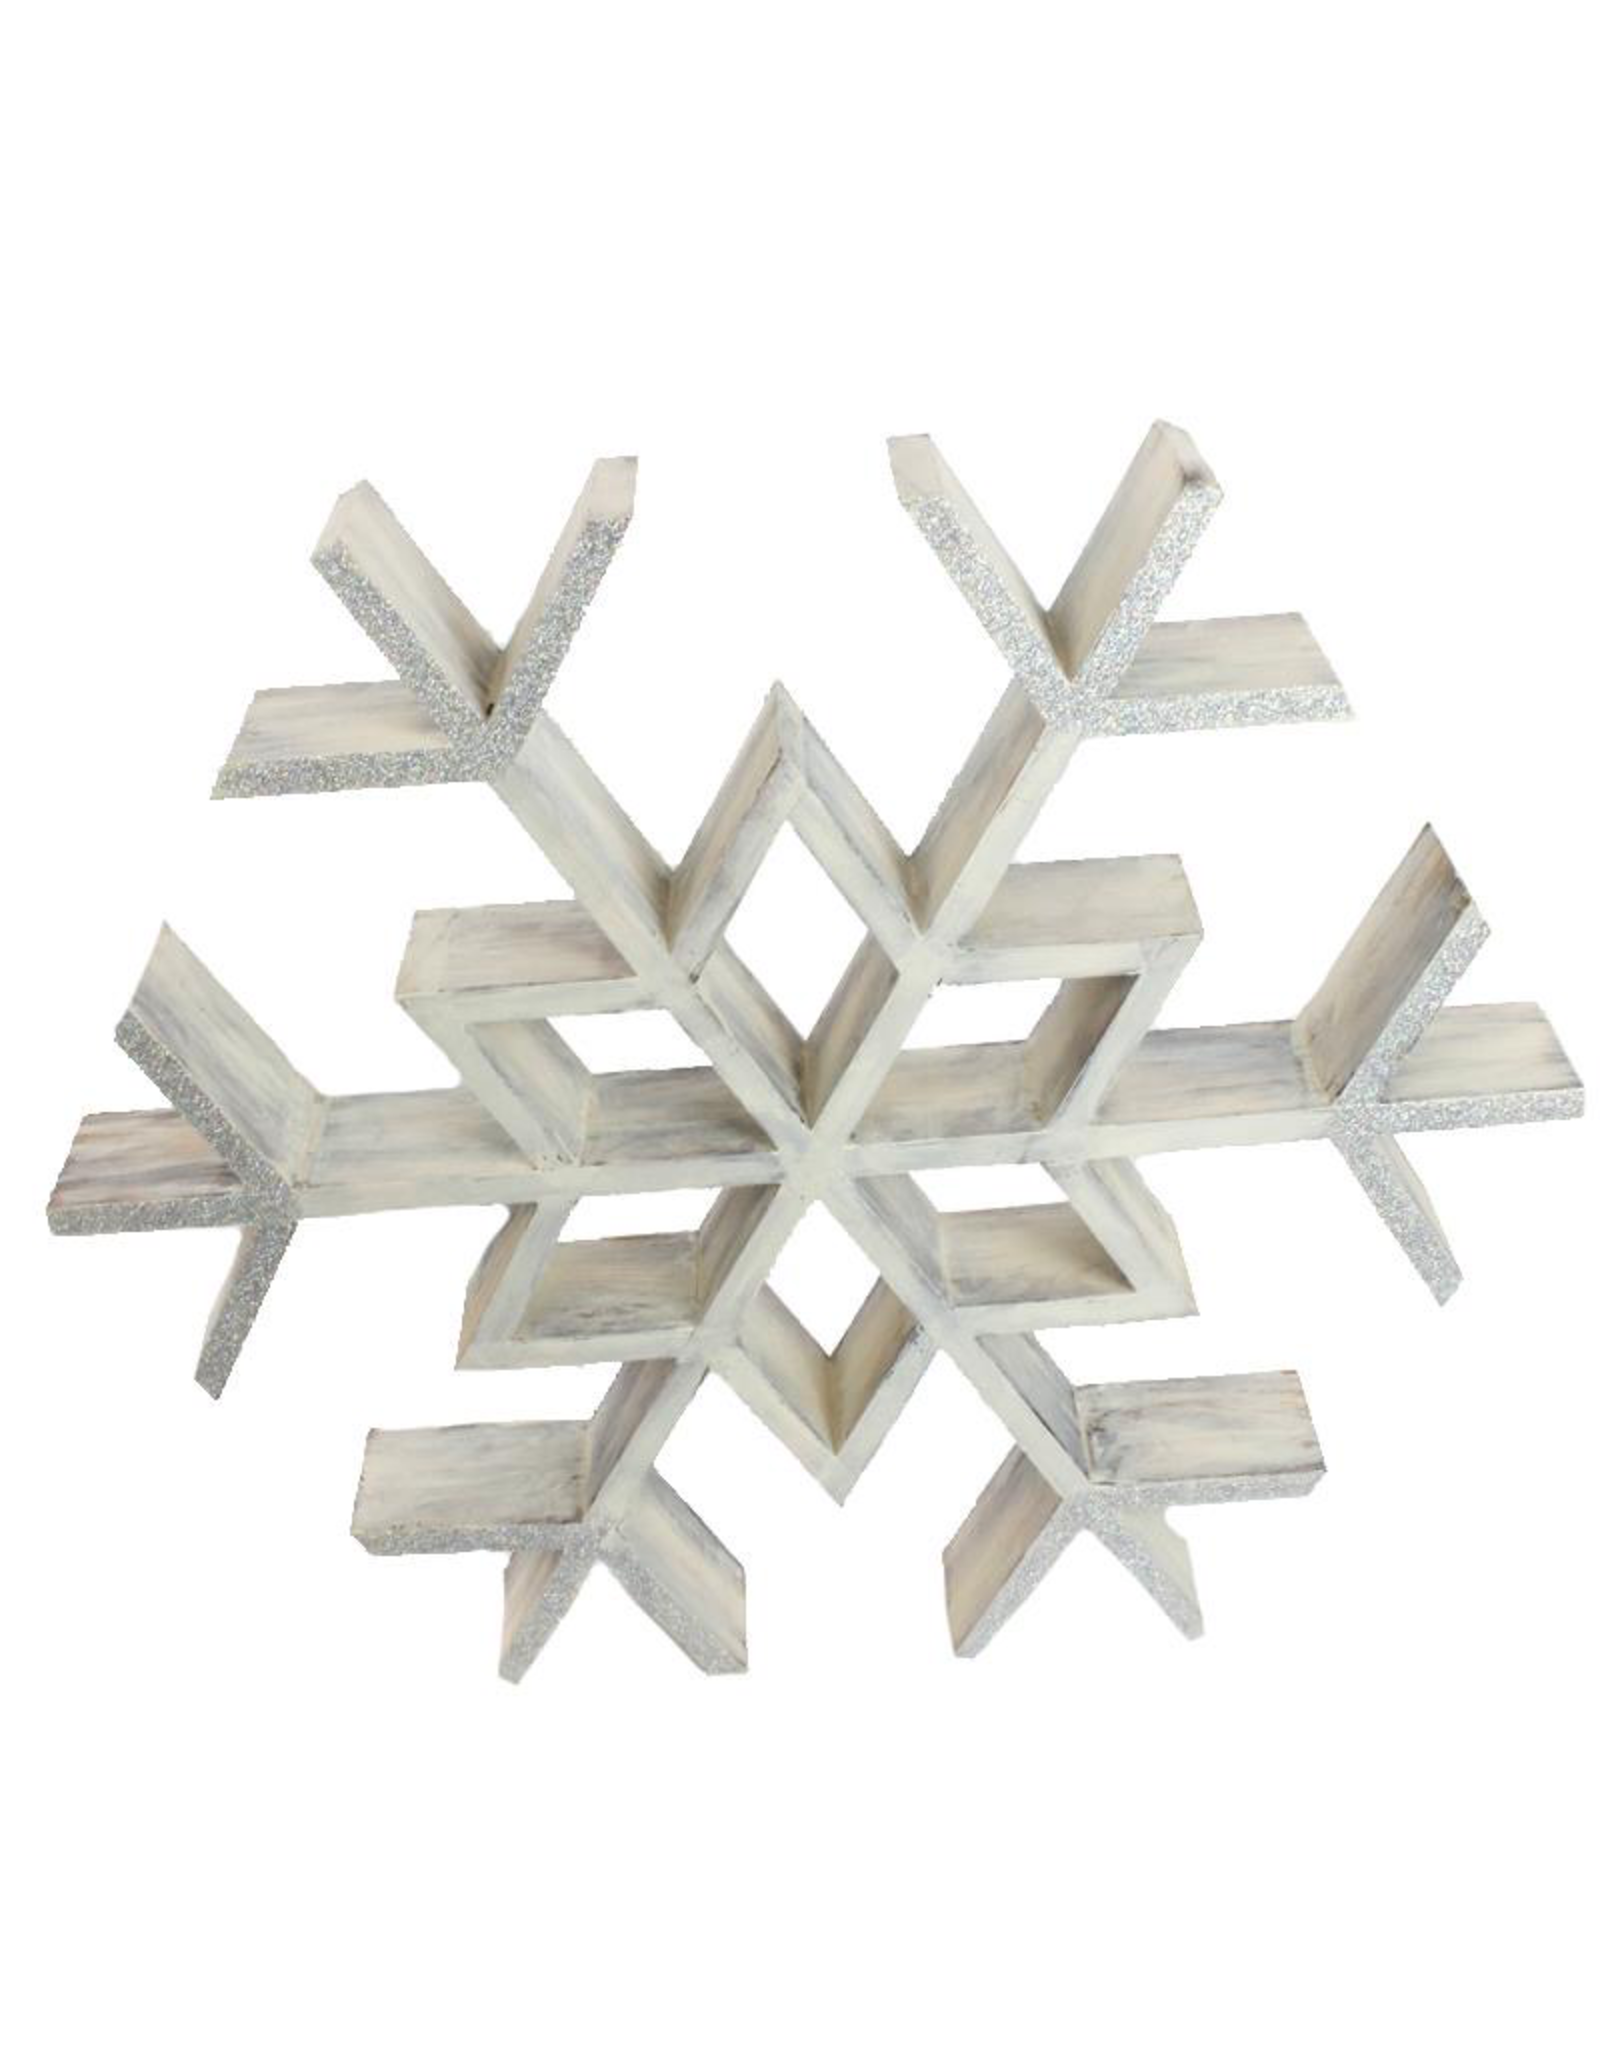 "FRANS KOPPER FK776 Hanging Wood Snowflake 19.75""x 17""x 2.5"""